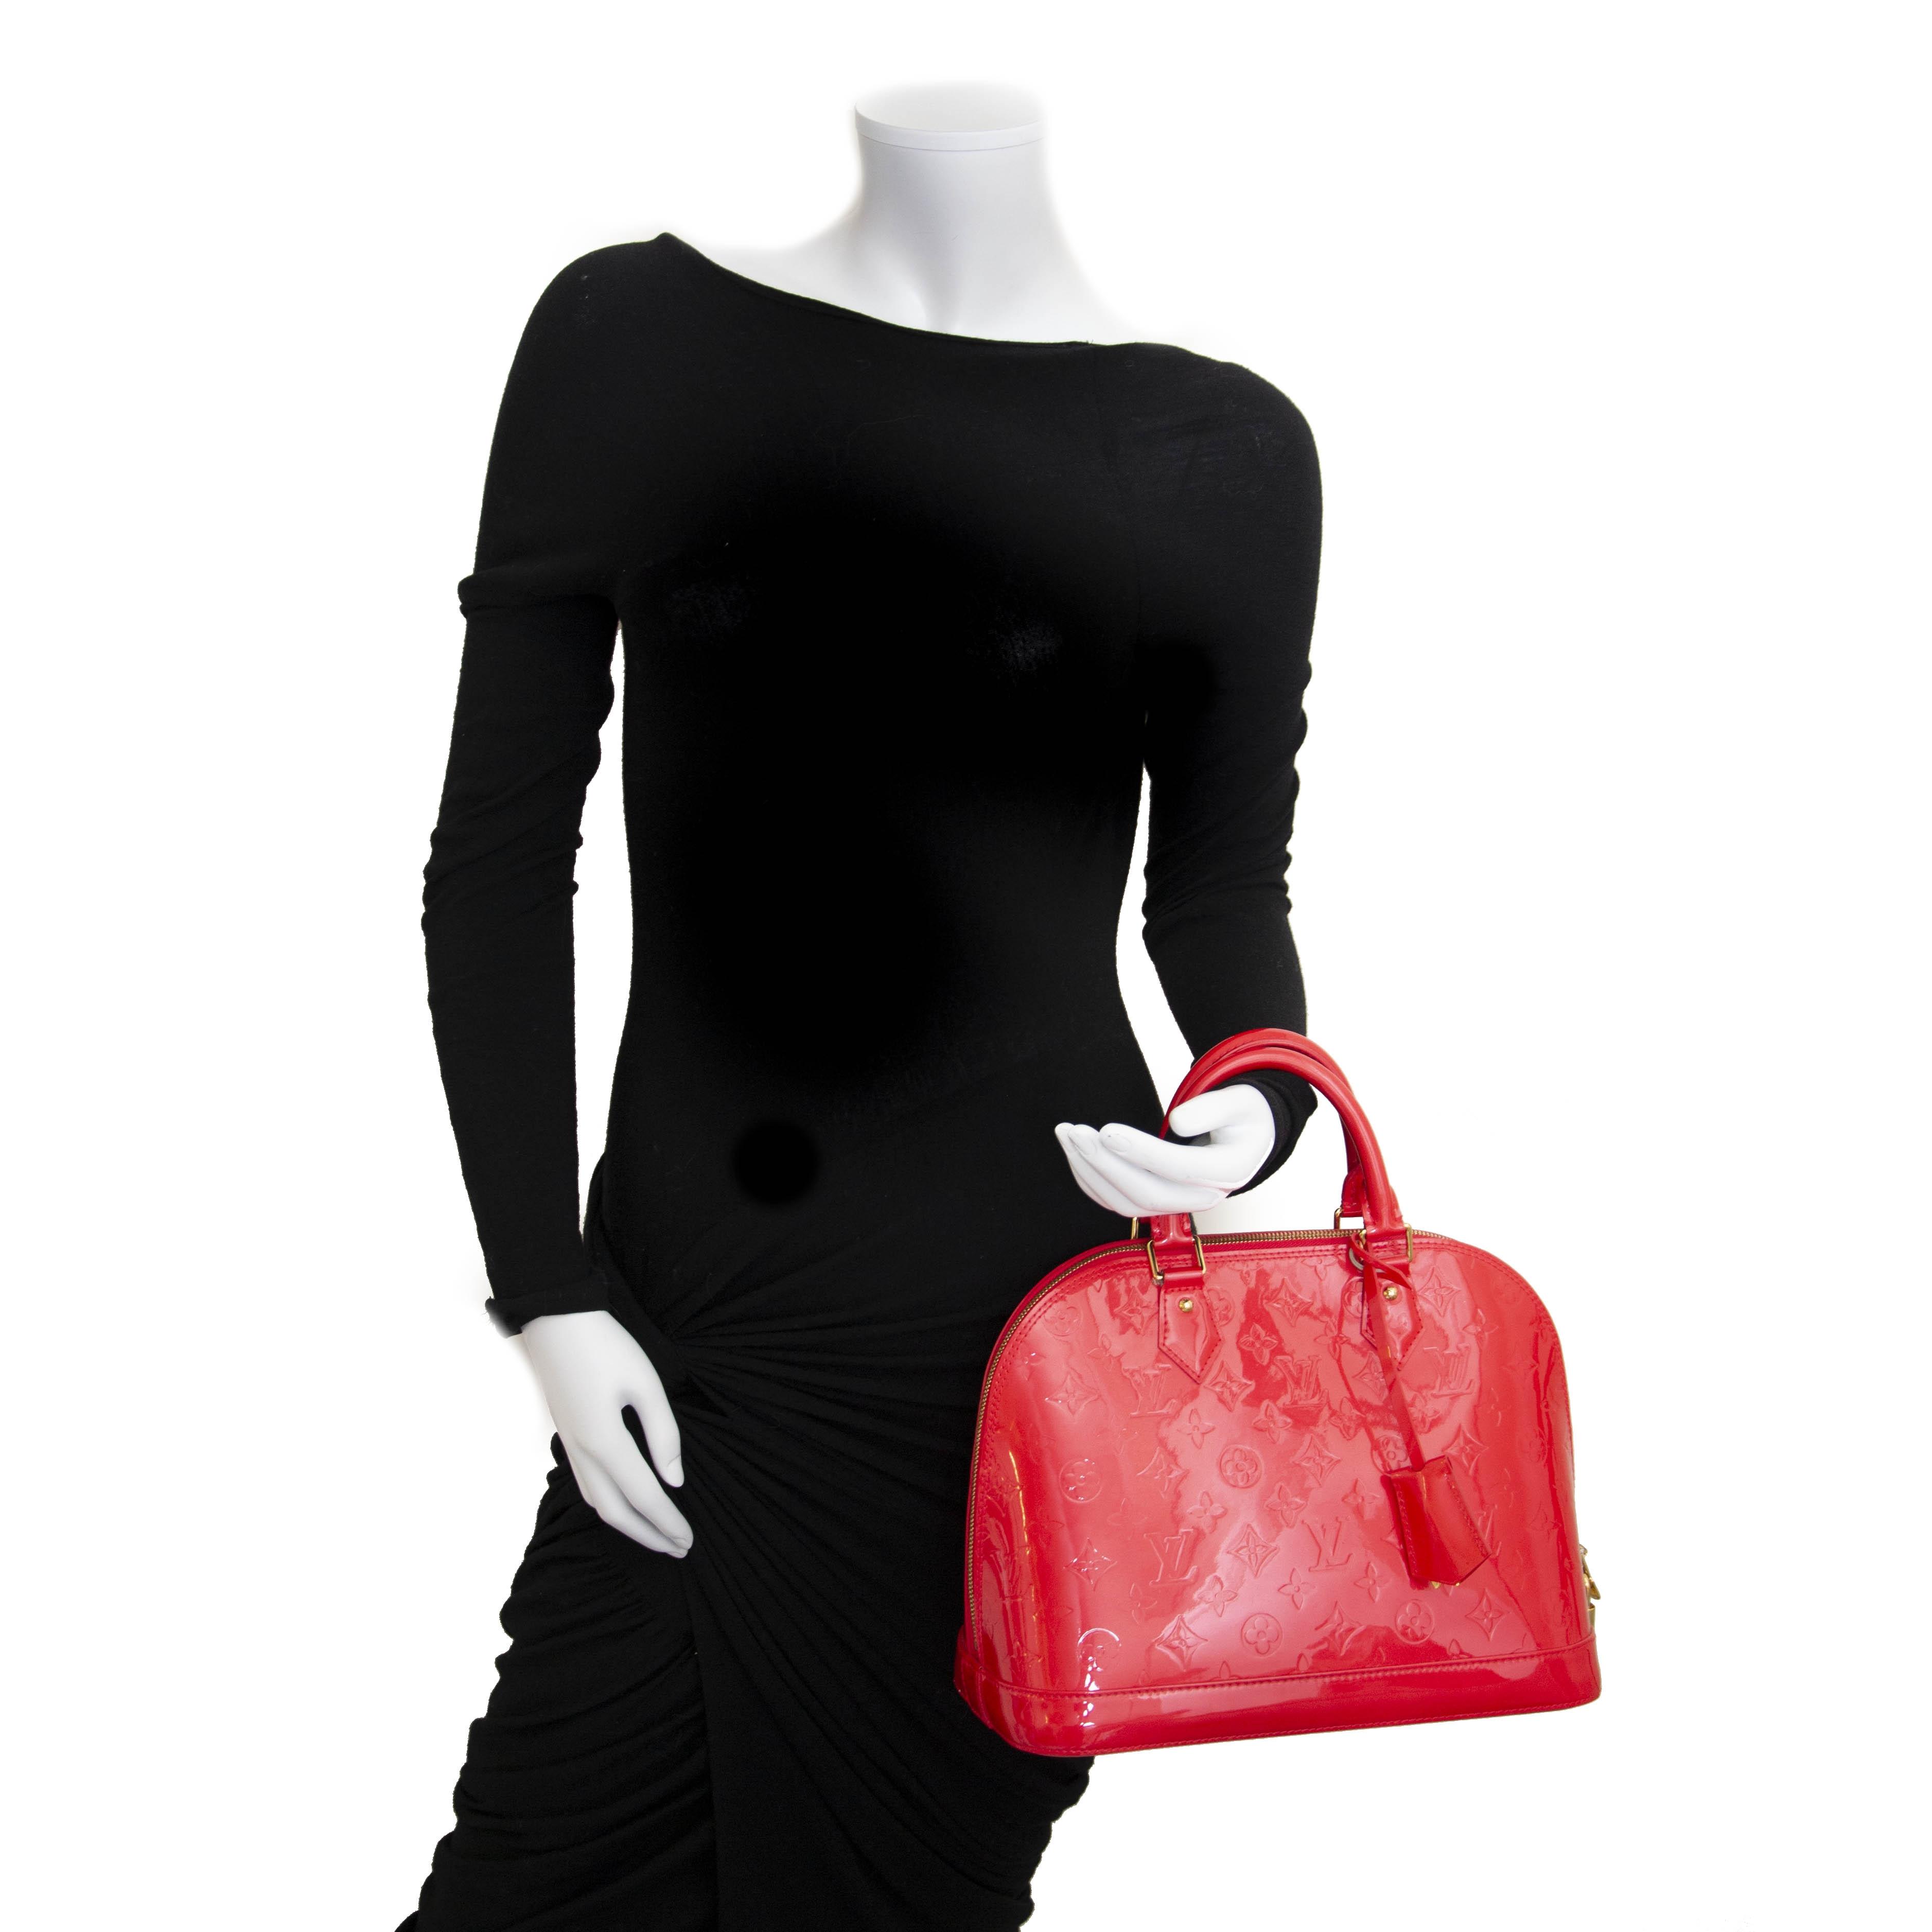 Louis Vuitton Alma PM Vernis Grenadin For the best price at LabelLov. Pour le meilleur prix à LabelLOV. Voor de beste prijs bij LabelLOV